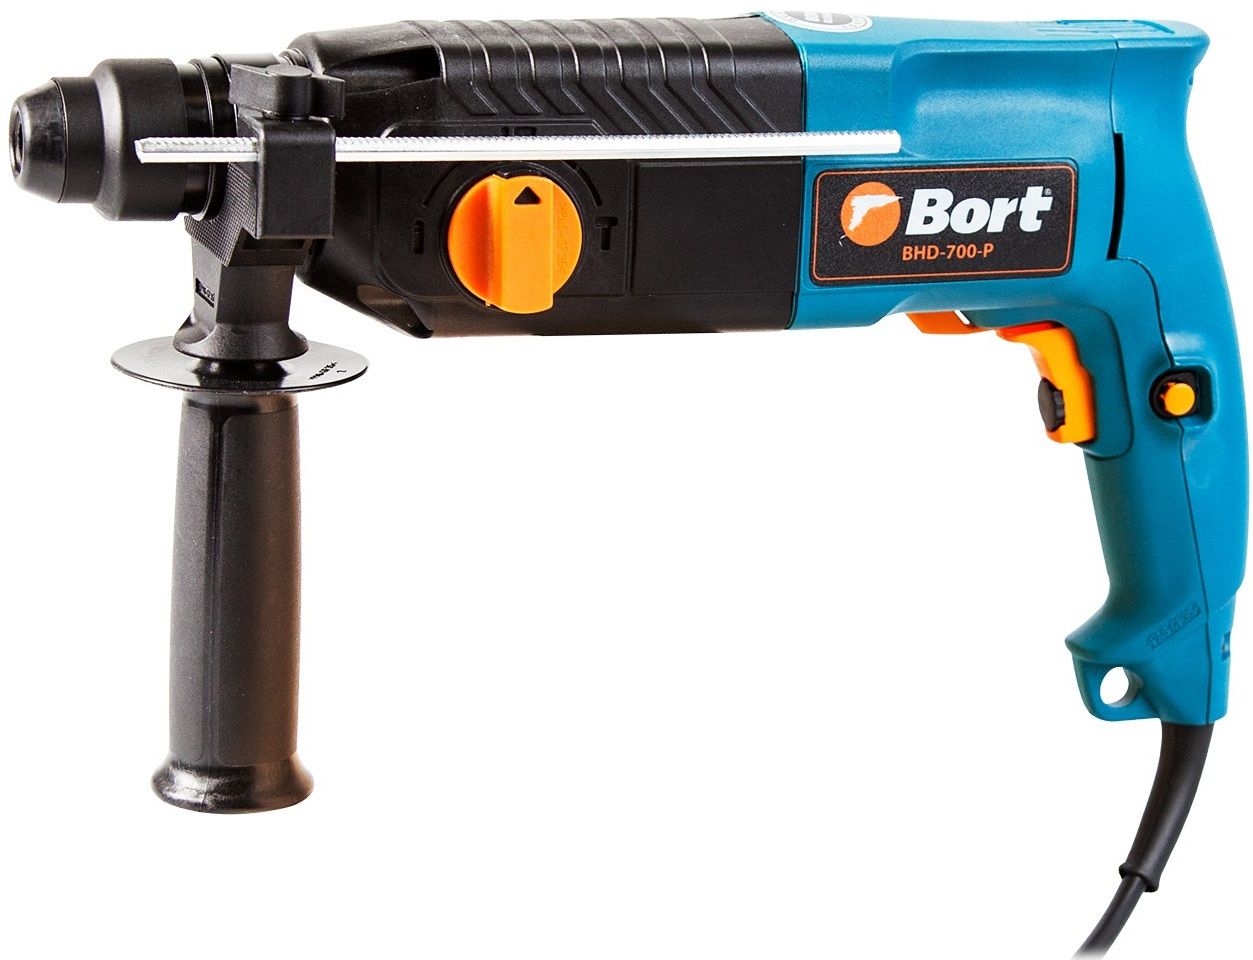 Перфоратор Bort BHD-700-P патрон:SDS-plus уд.:3Дж 700Вт